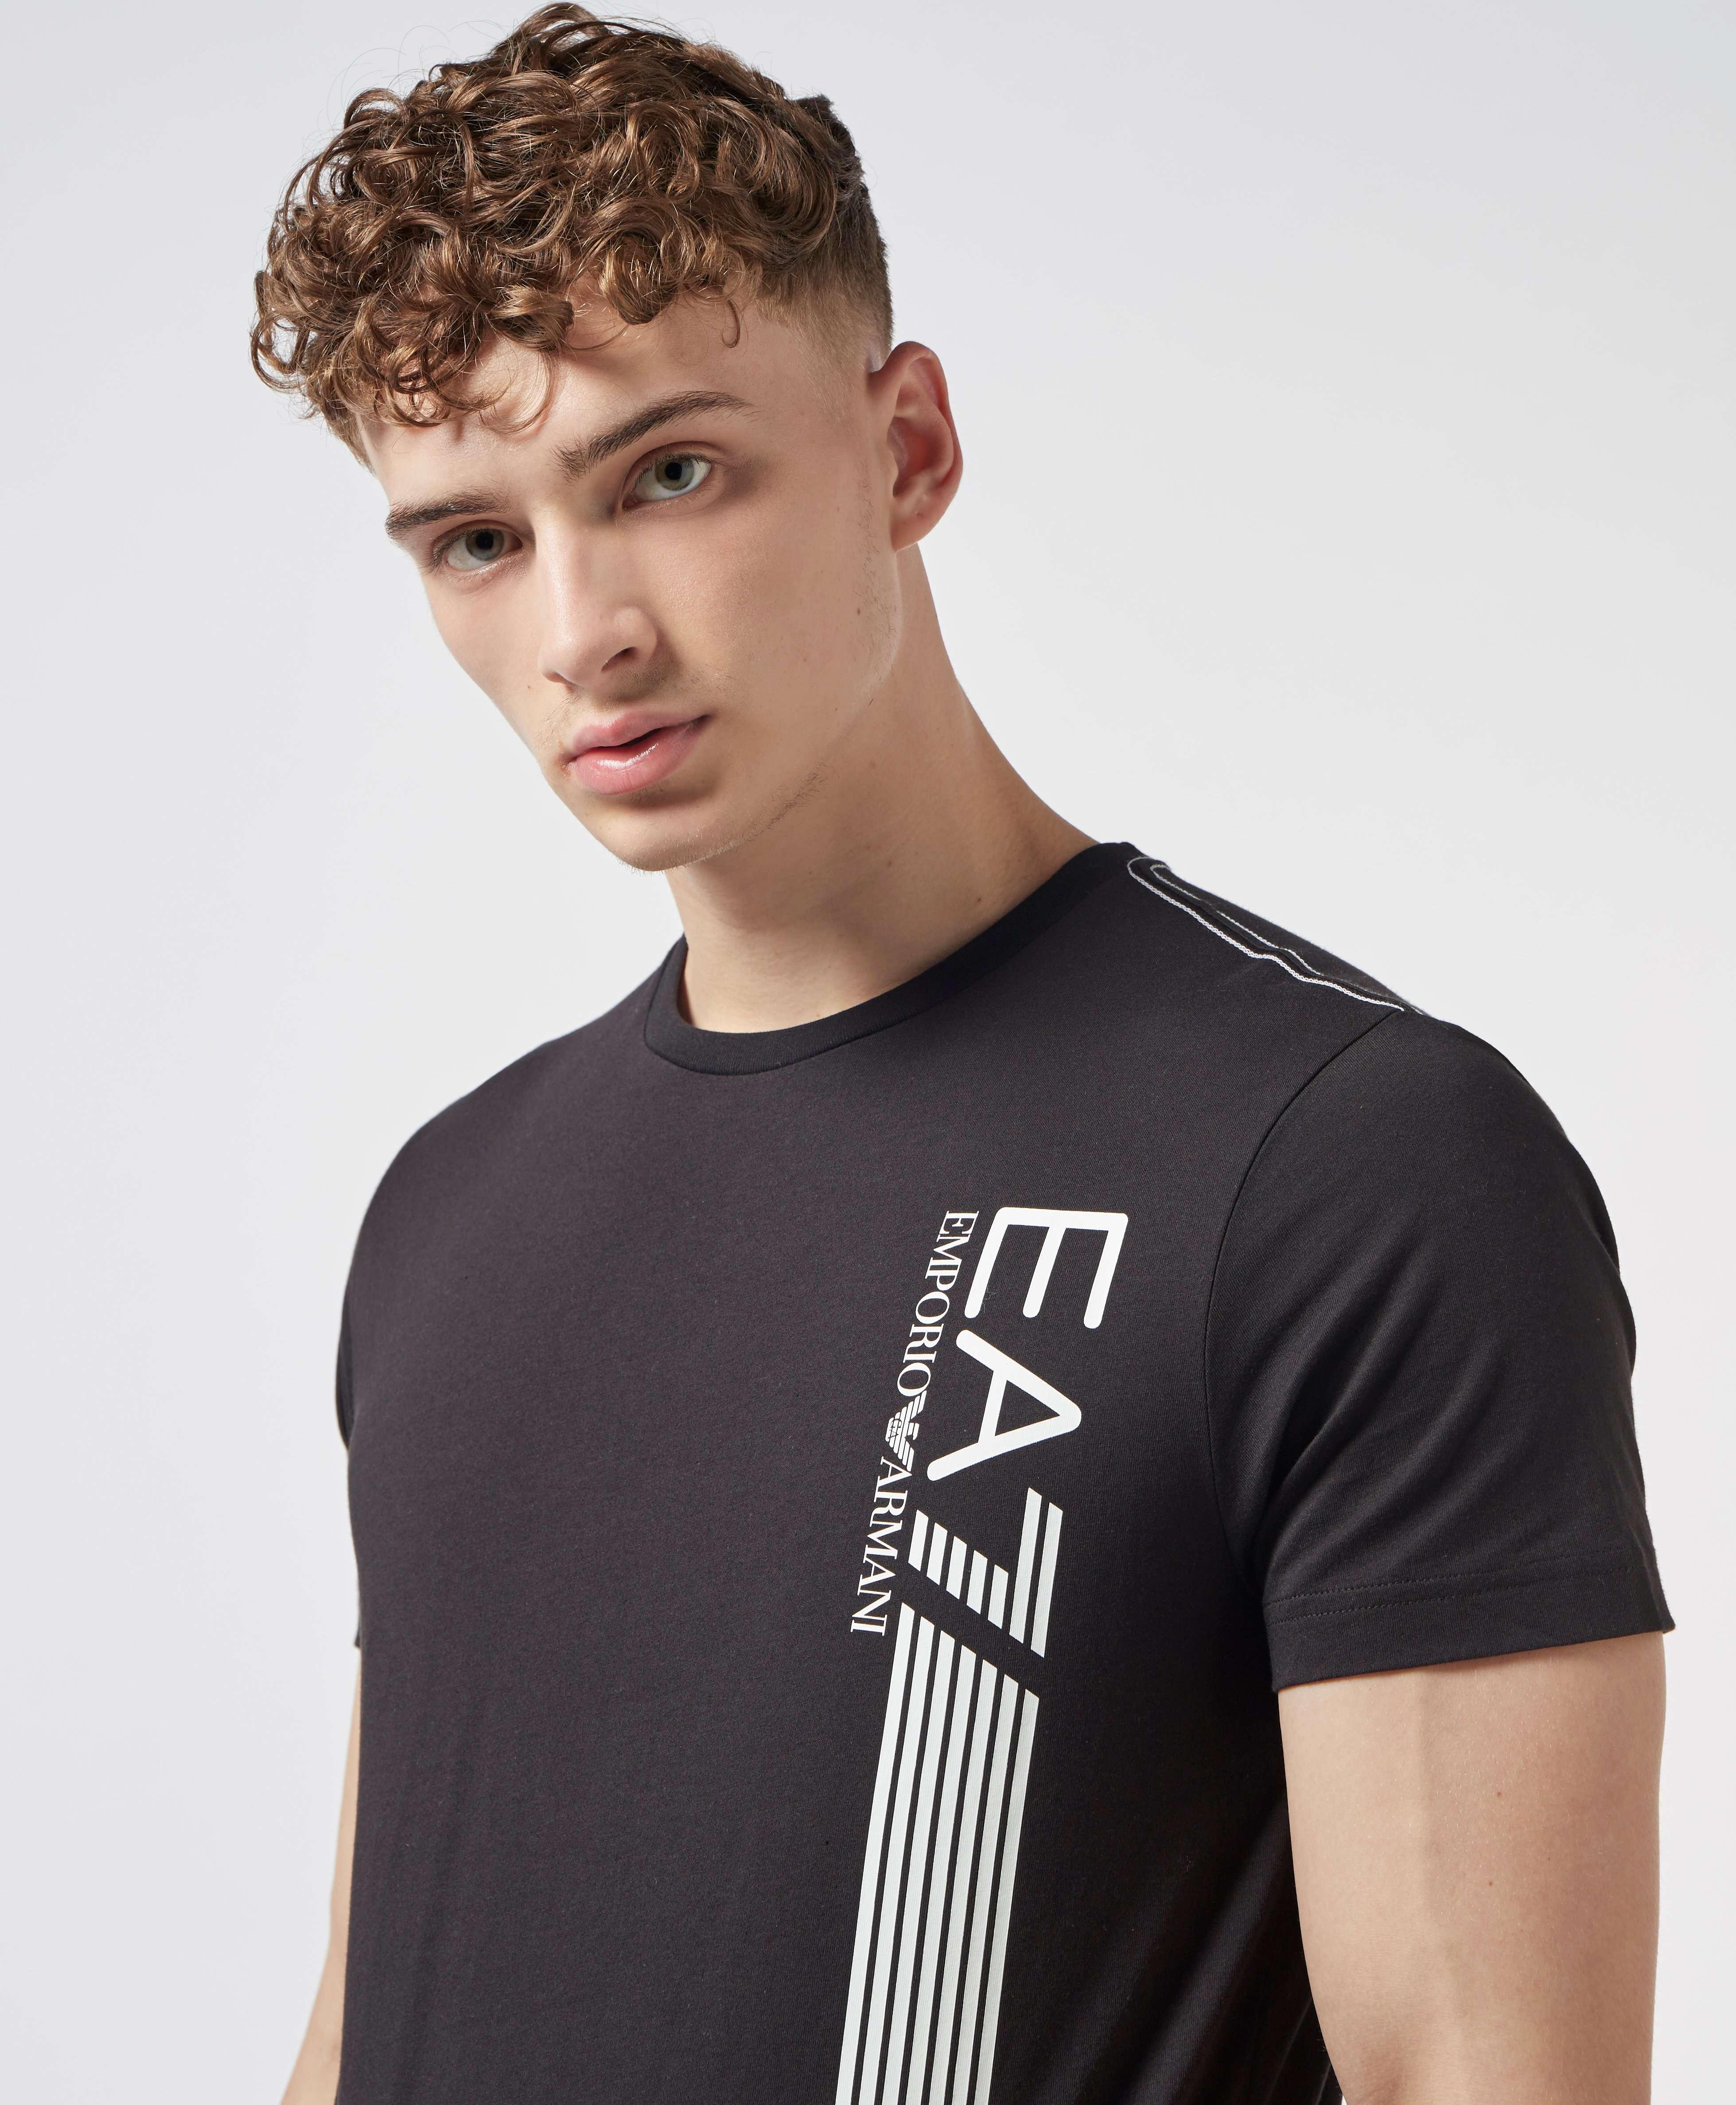 Emporio Armani EA7 7 Lines Short Sleeve T-Shirt